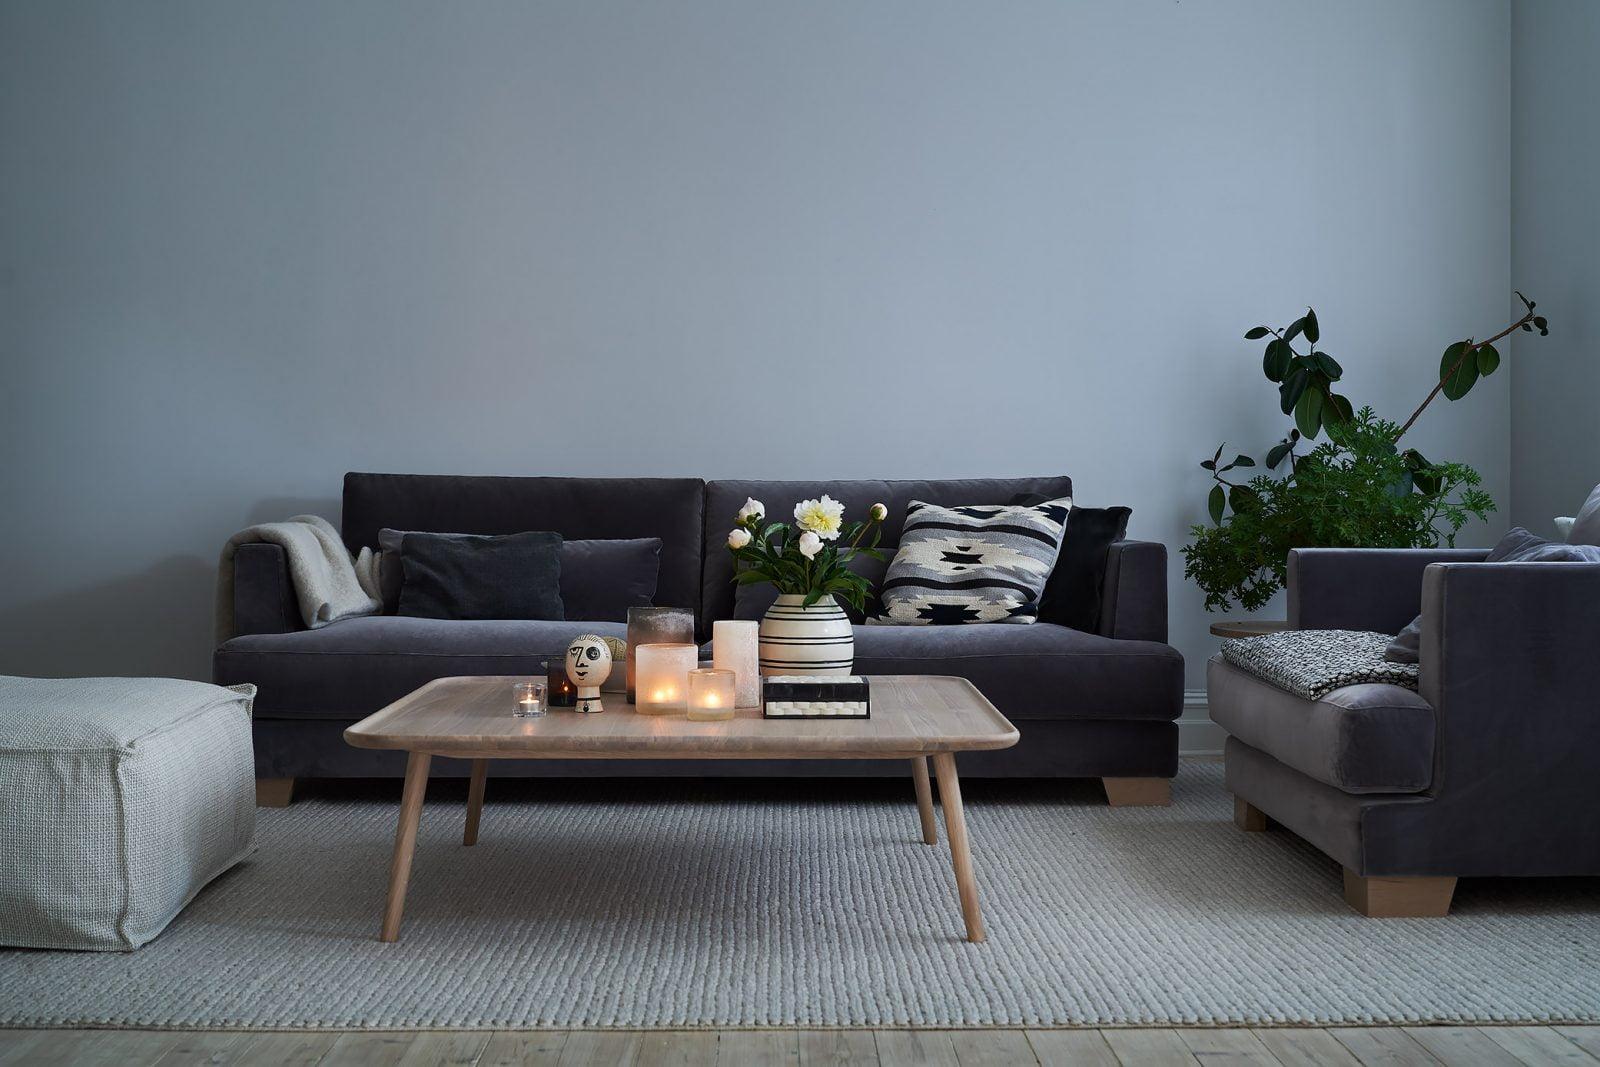 BRANDON_arrangement_3seater_armchair_lario2003_dark_grey_4